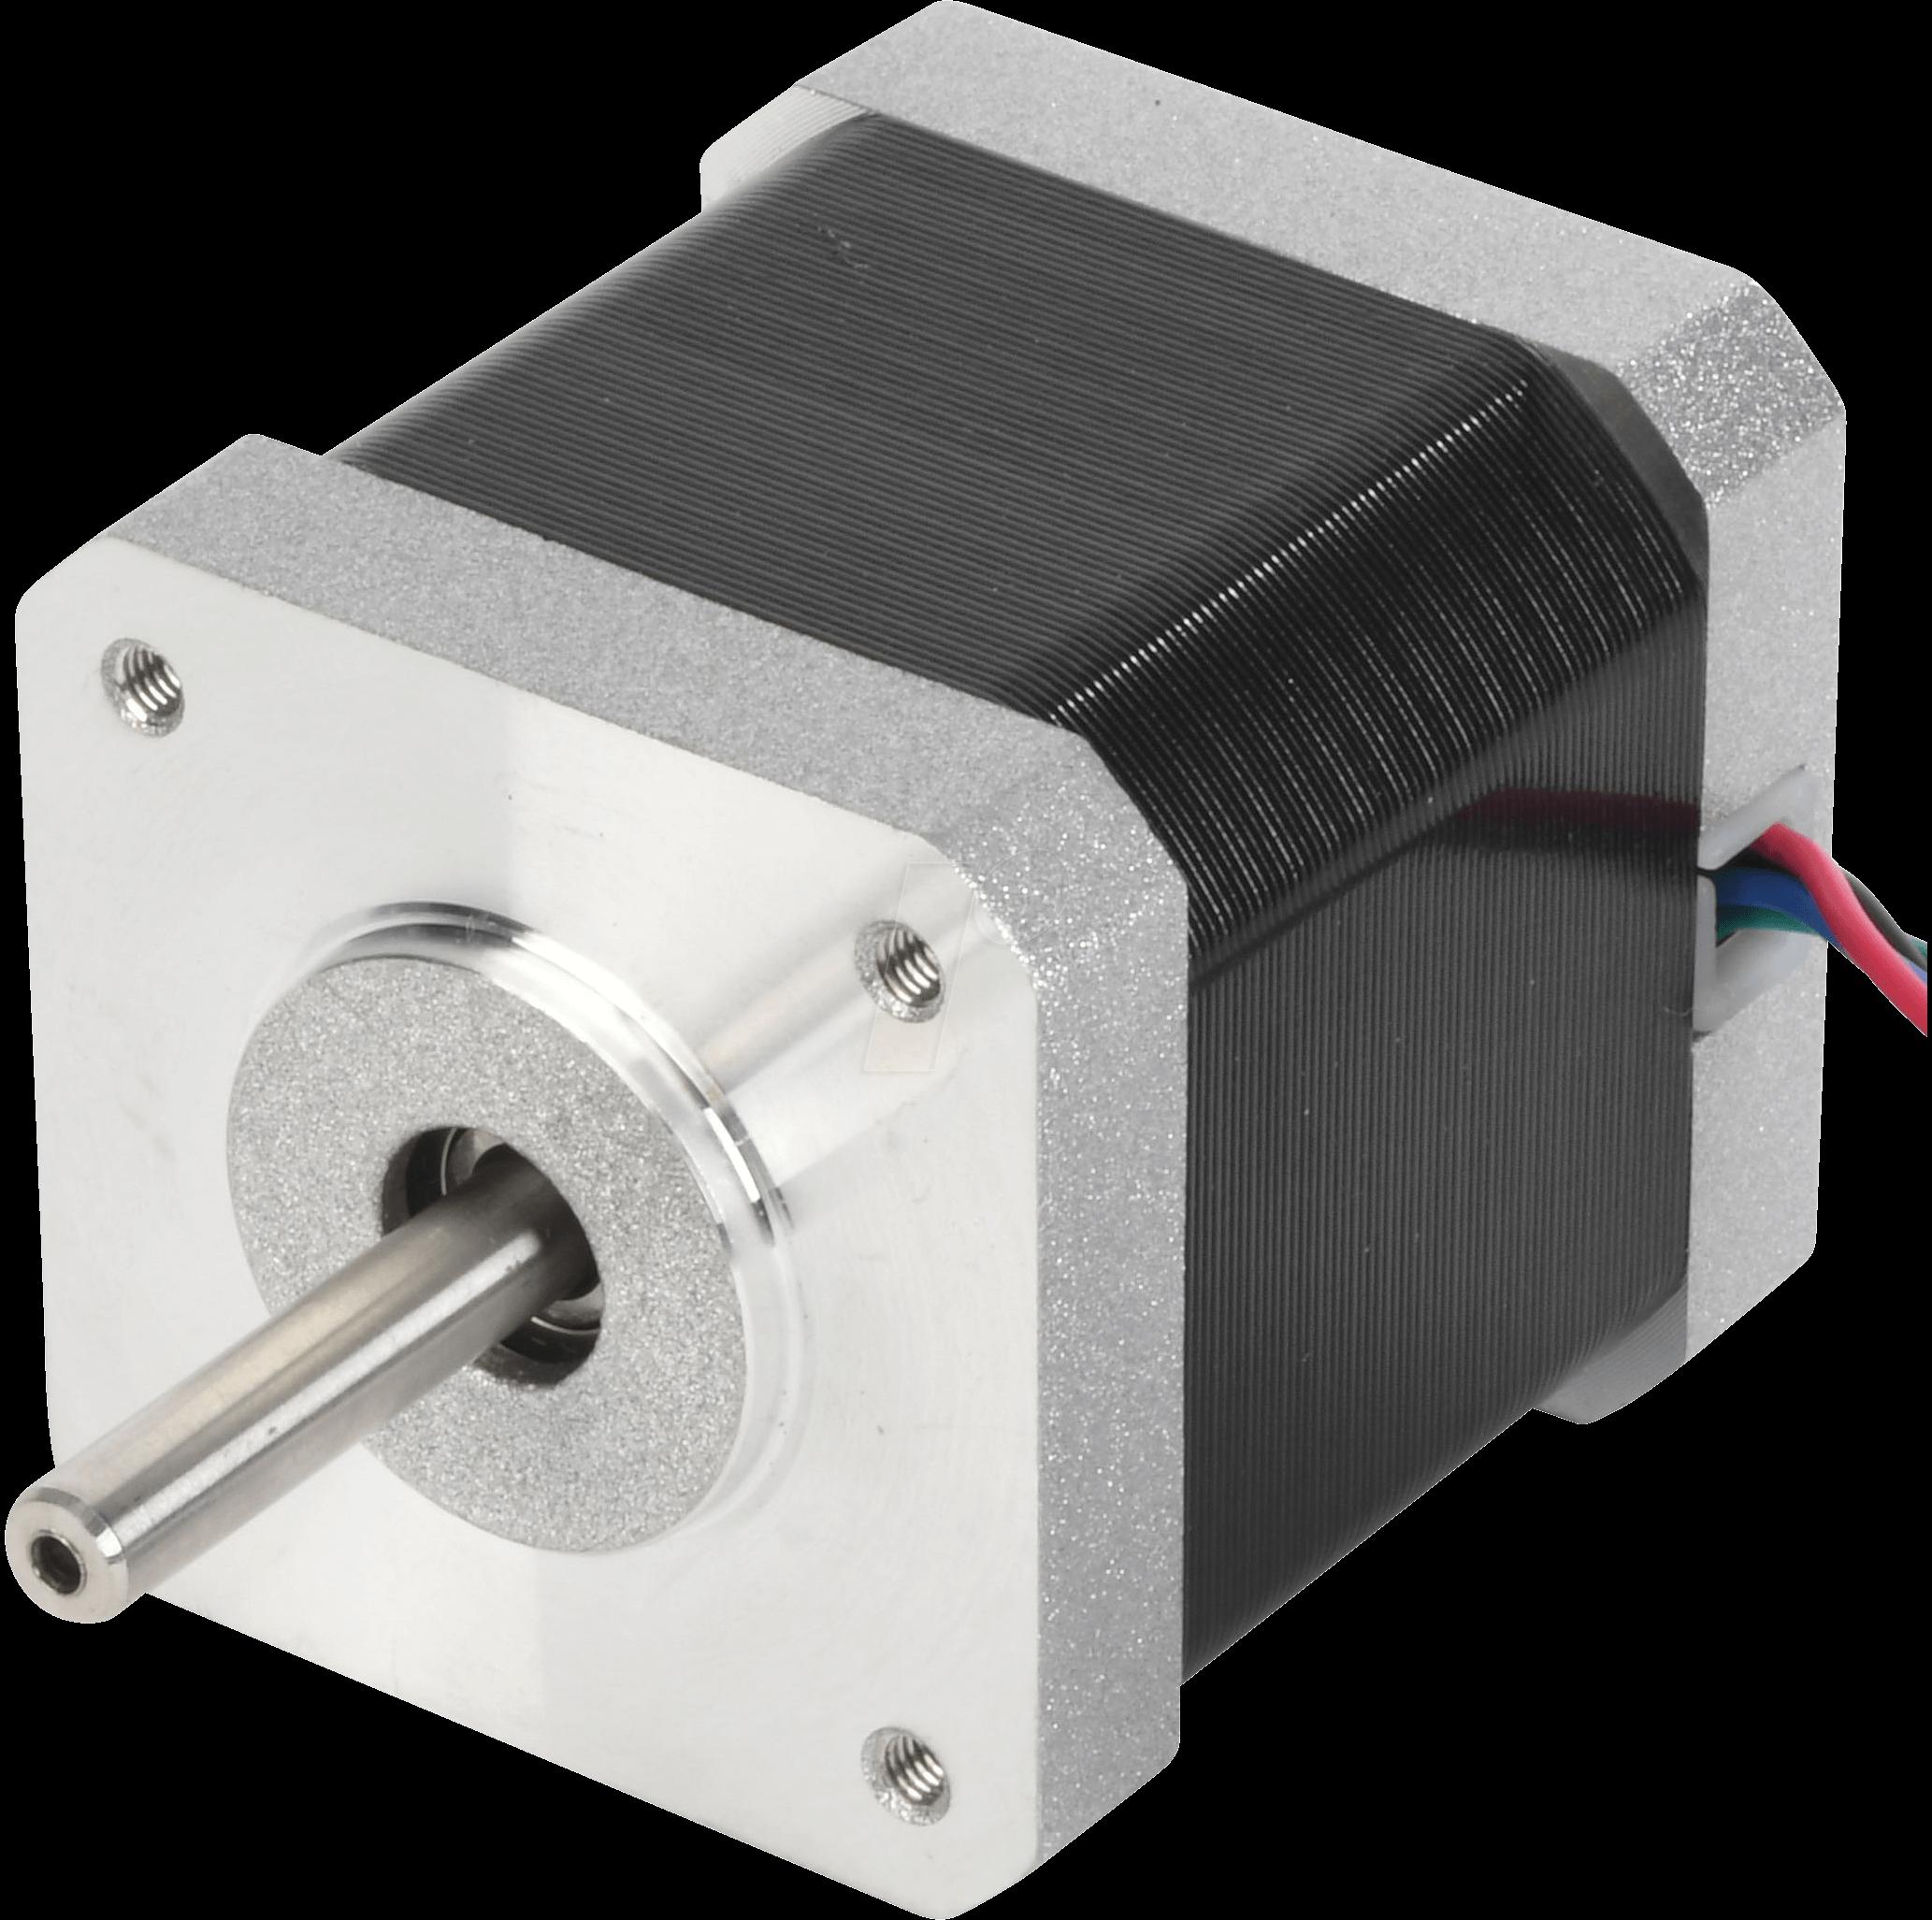 ACT 17HS5425 - Schrittmotor, 4 pol, 1,8 °, 3,1 V DC